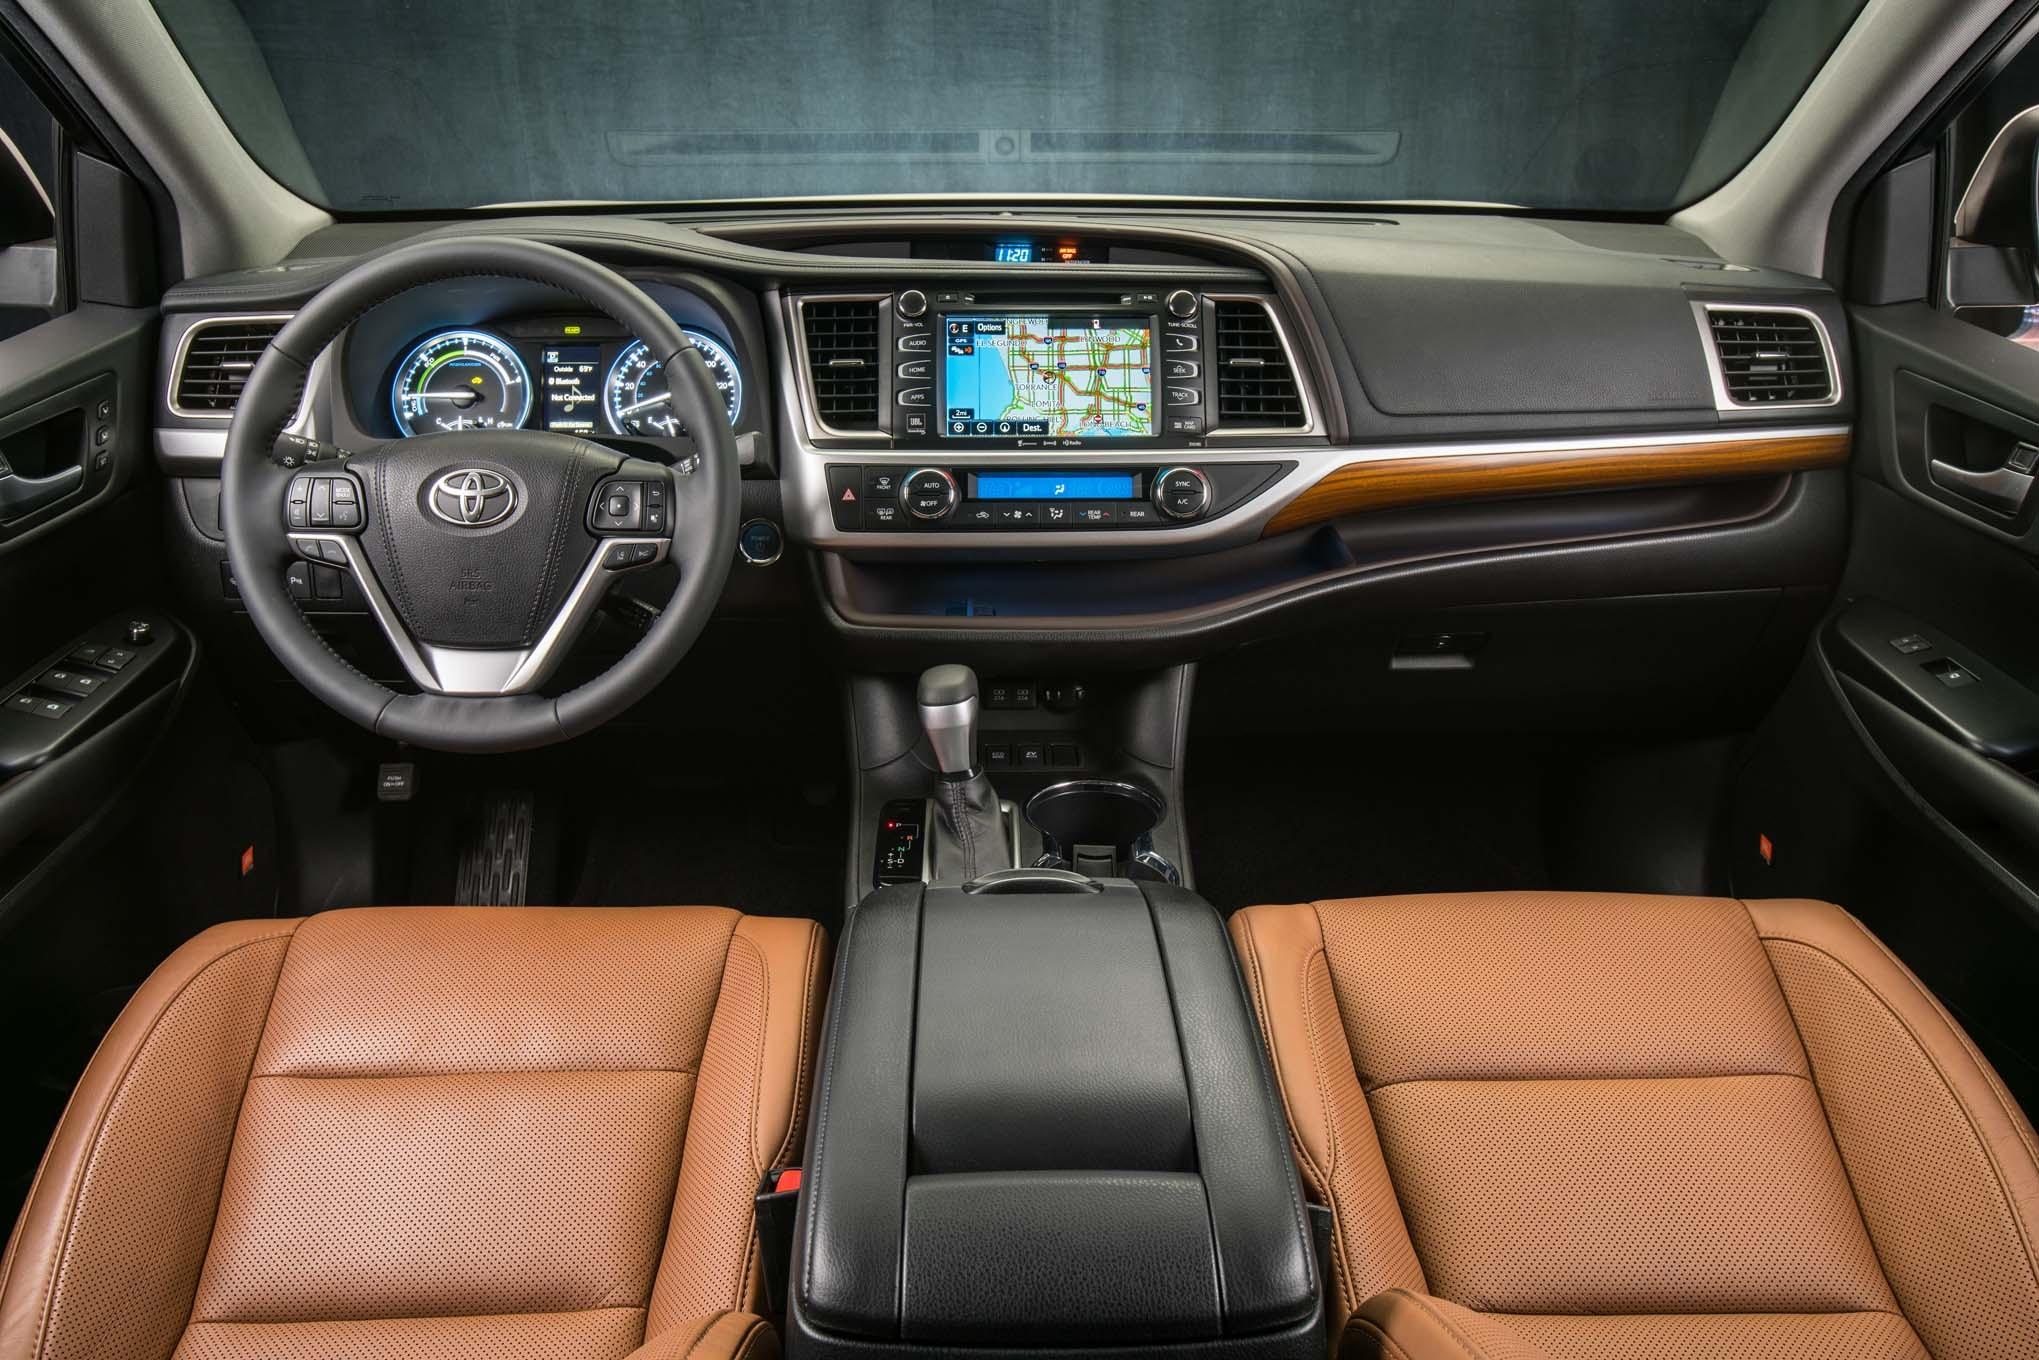 2017 Toyota Highlander Hybrid Limited Platinum Interior 60 13 Noviembre 2016